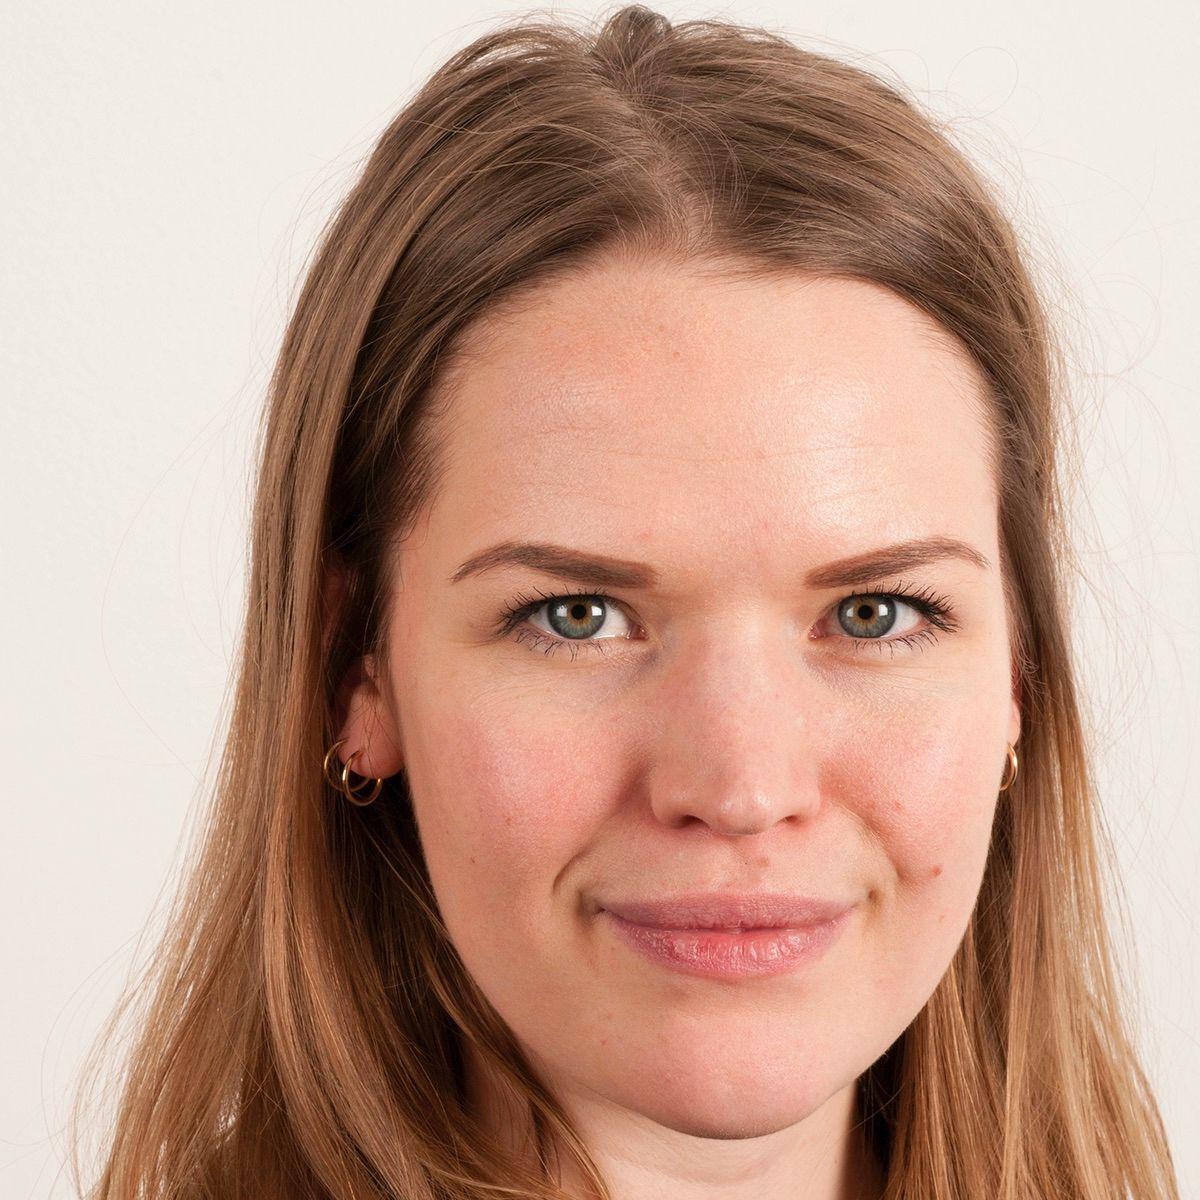 Astrid Hauge Rambøl